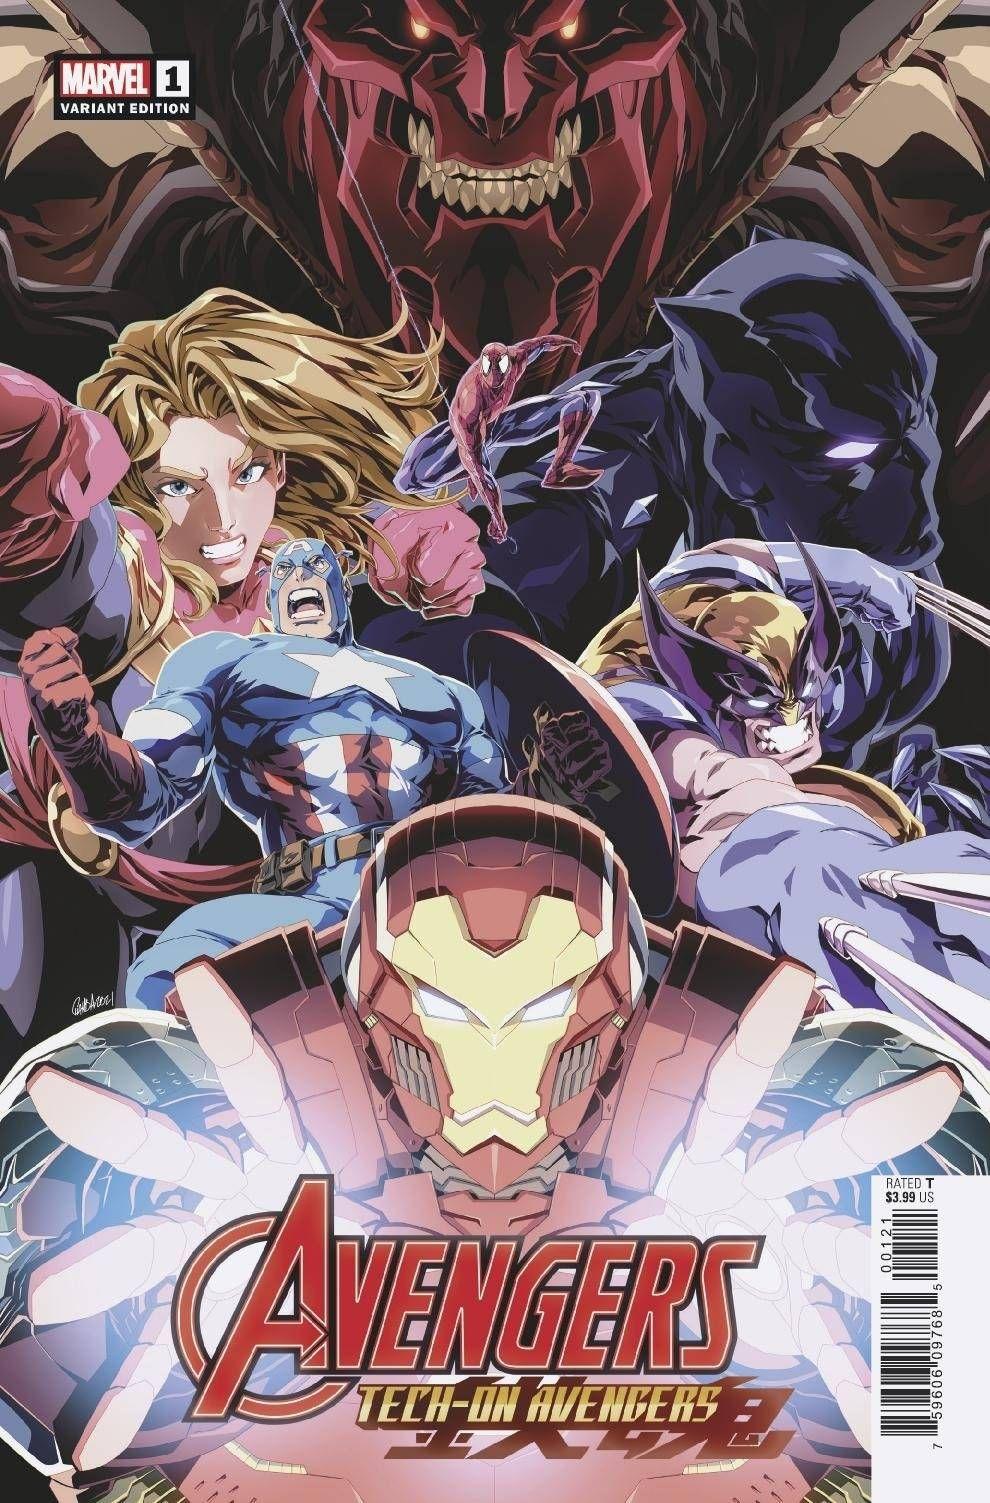 eyJidWNrZXQiOiJnb2NvbGxlY3QuaW1hZ2VzLnB1YiIsImtleSI6IjE1NGI3NWI2LTViZTQtNGU0OC05YmI2LWFmNDFmZDVhMjI4NC5qcGciLCJlZGl0cyI6W119 ComicList: Marvel Comics New Releases for 08/11/2021